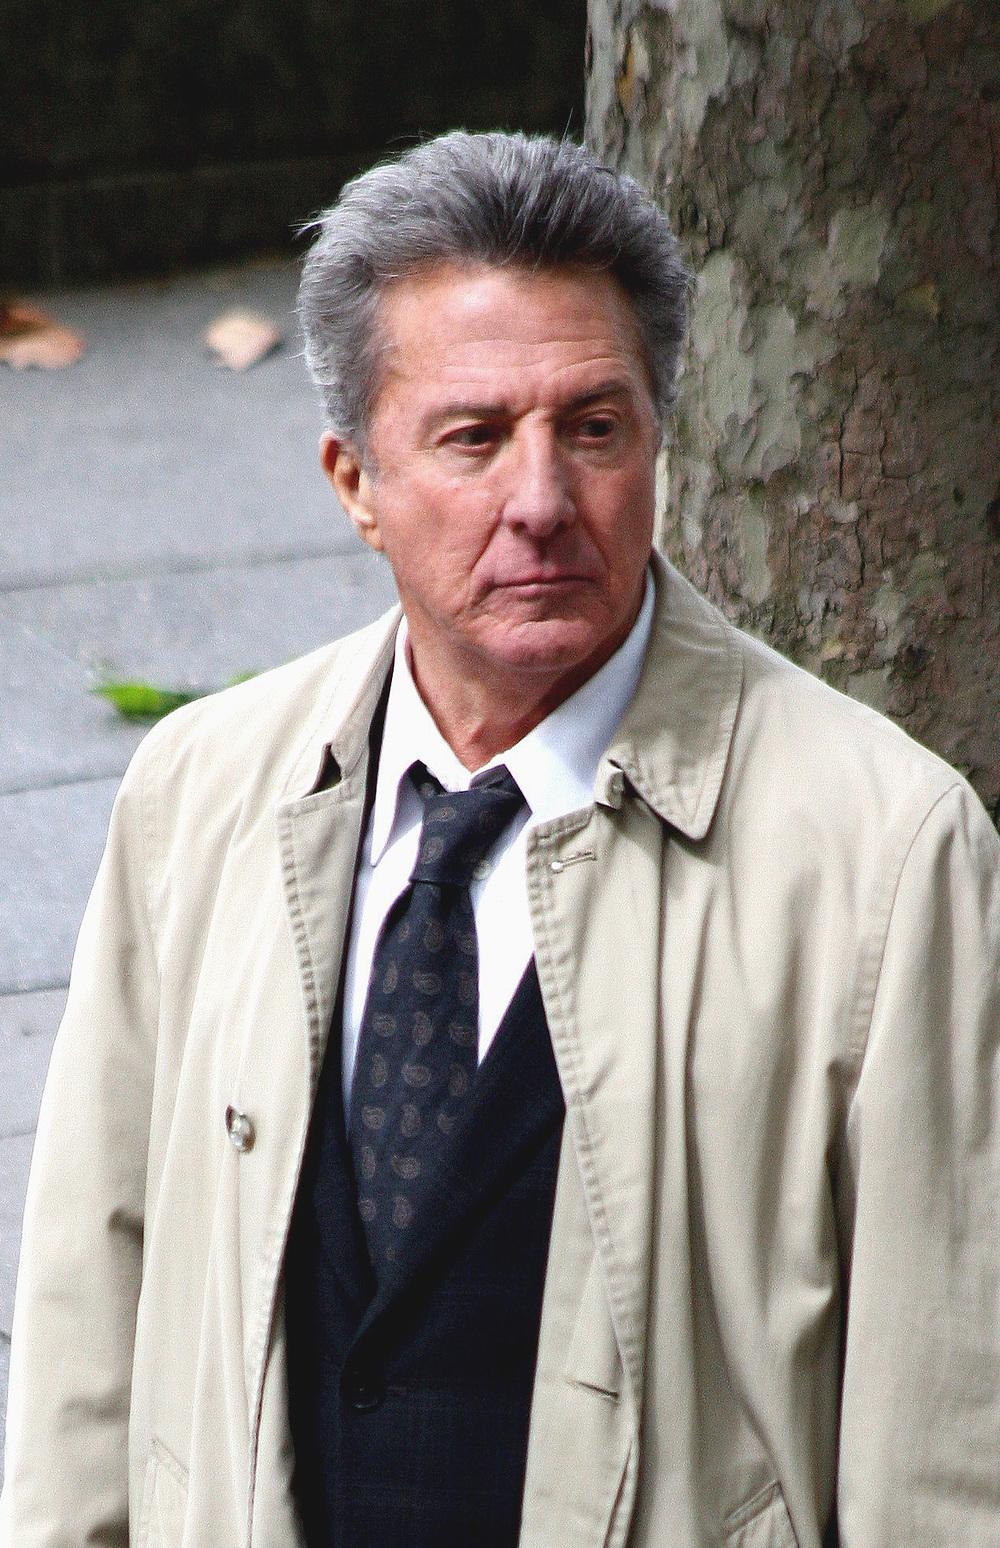 Dustin Hoffman. Credit: Wikimedia Commons.